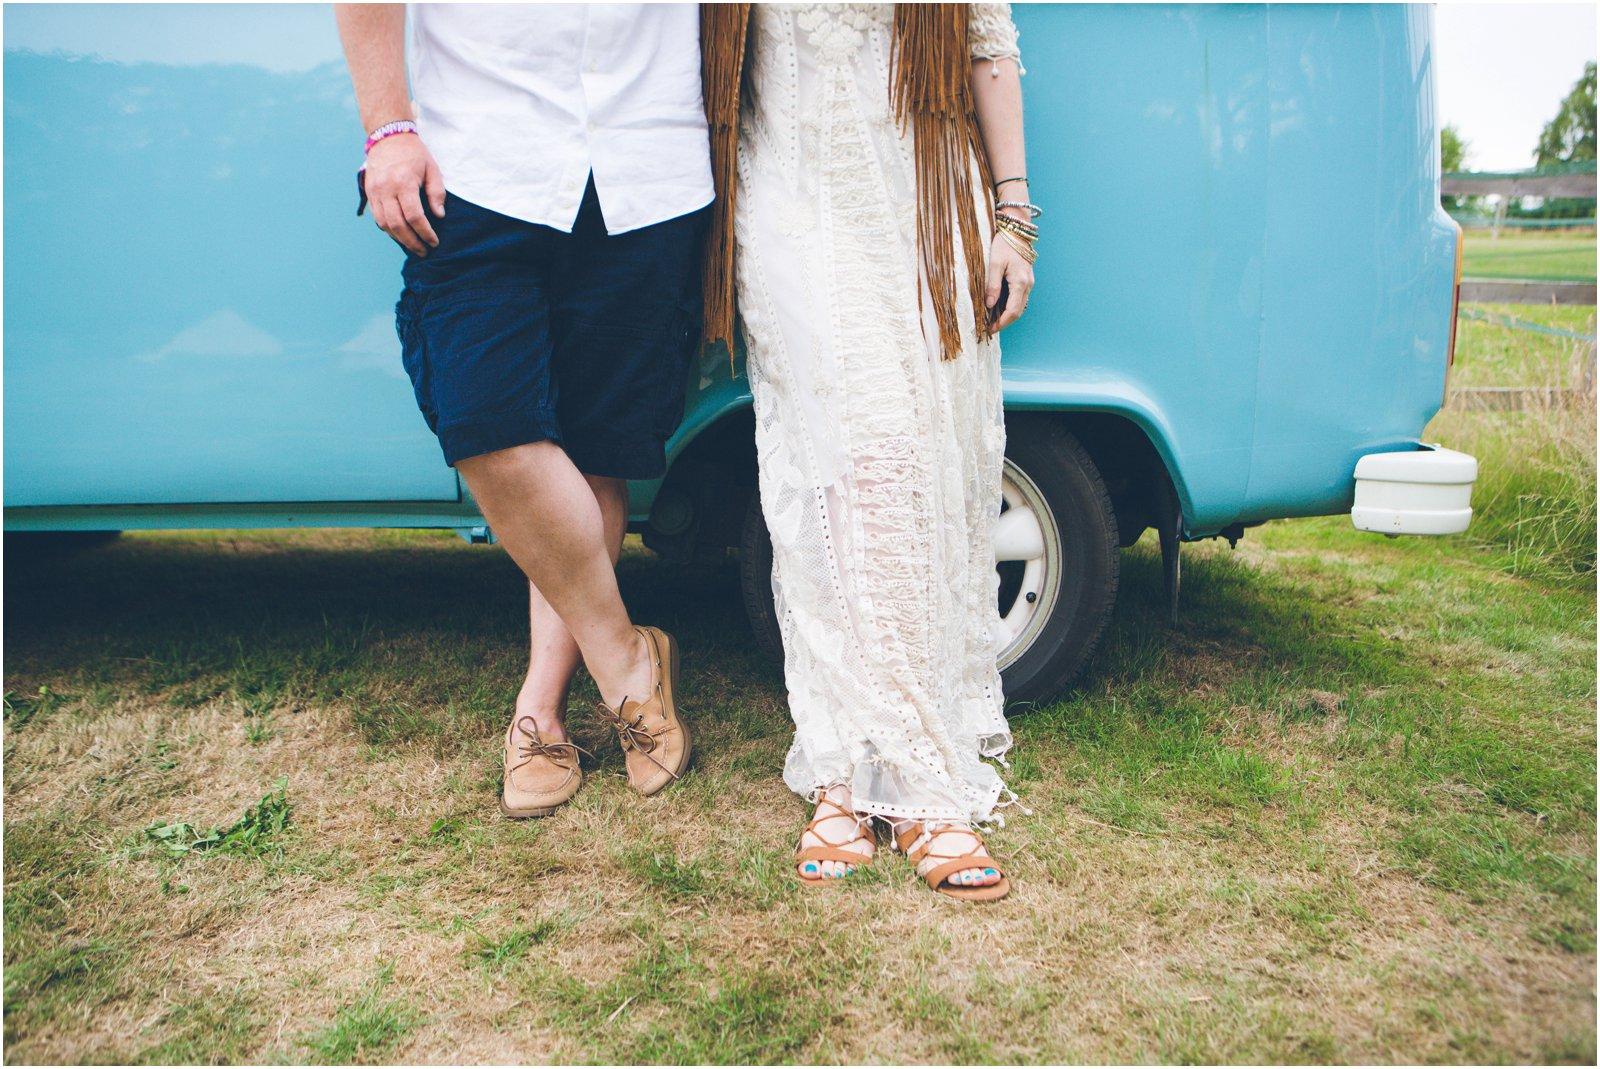 Sally and Damien's wedding festival by Summertown Pictures-72_DerrynSchmidt